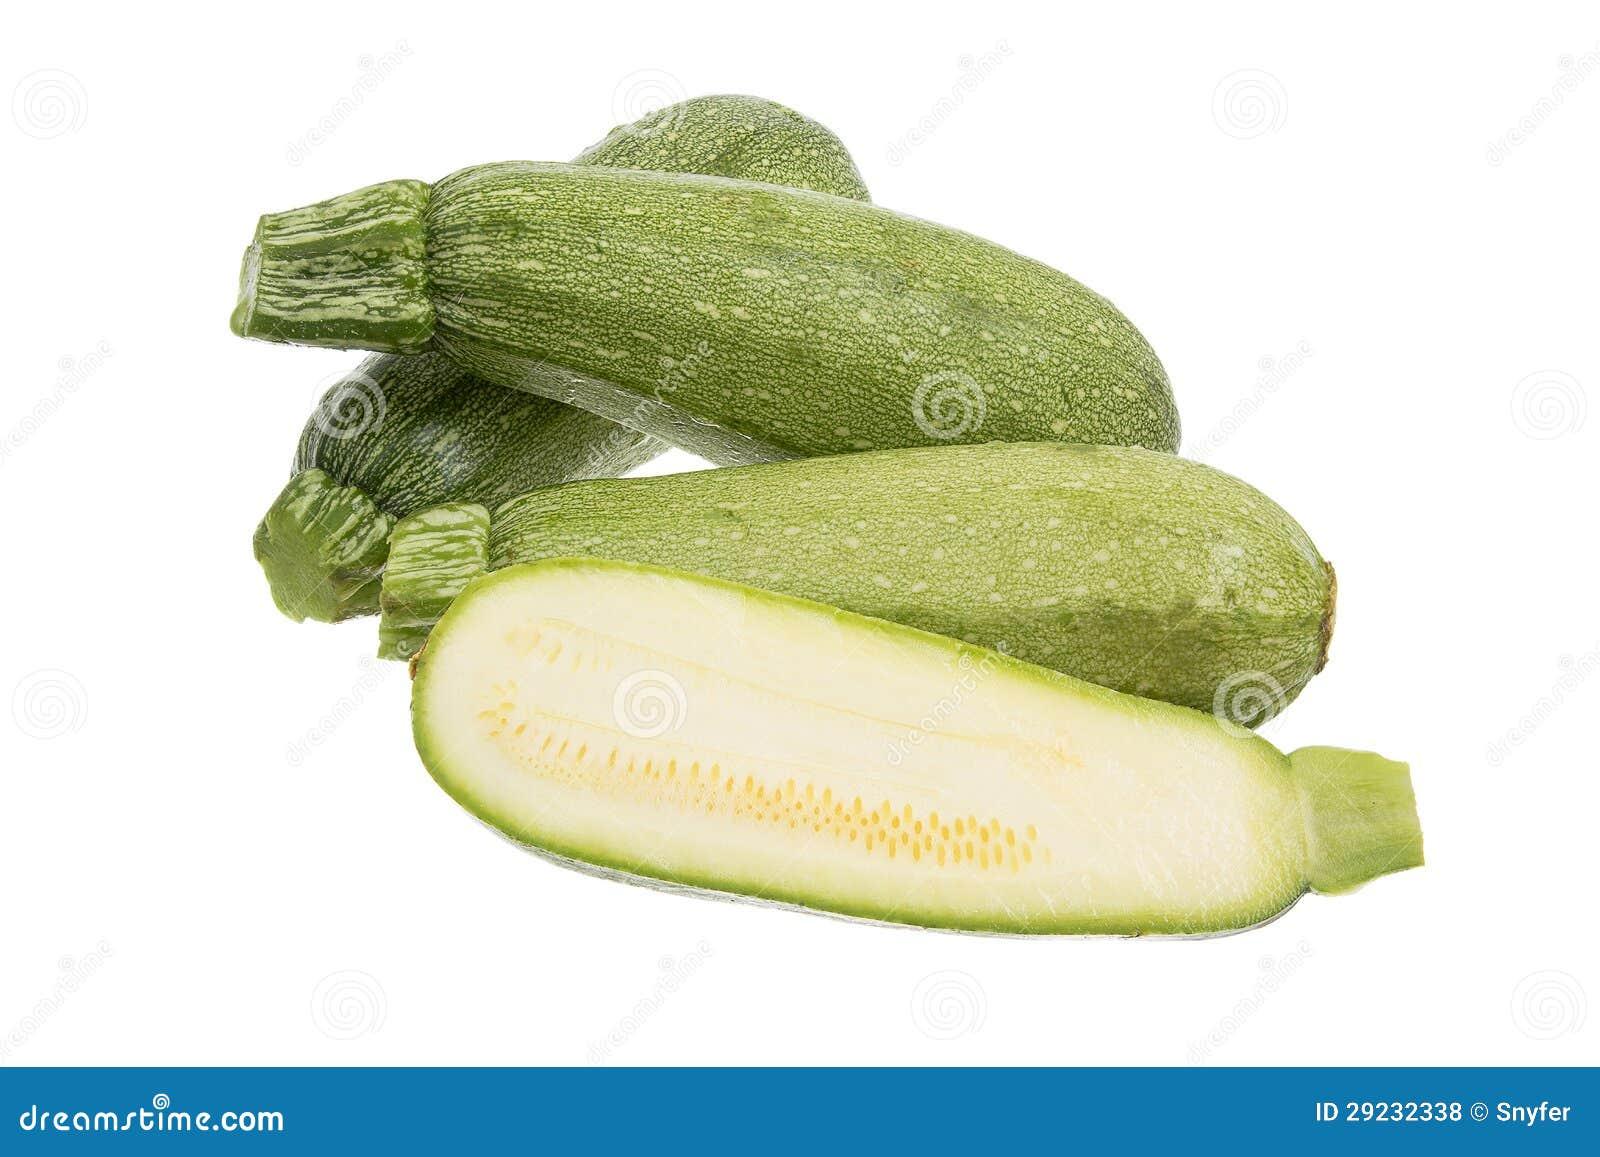 Download Luz - polpa mexicana verde foto de stock. Imagem de vitaminas - 29232338